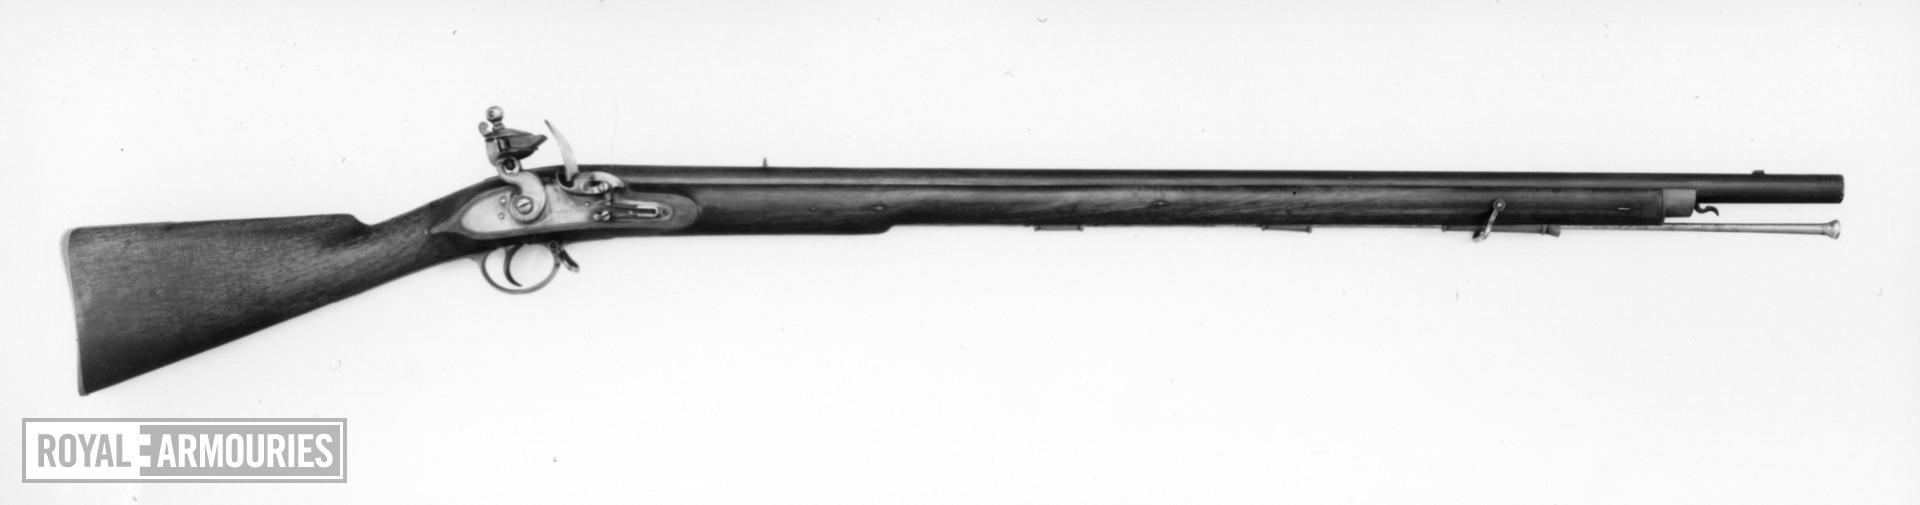 Flintlock muzzle-loading musket - By Westley Richards